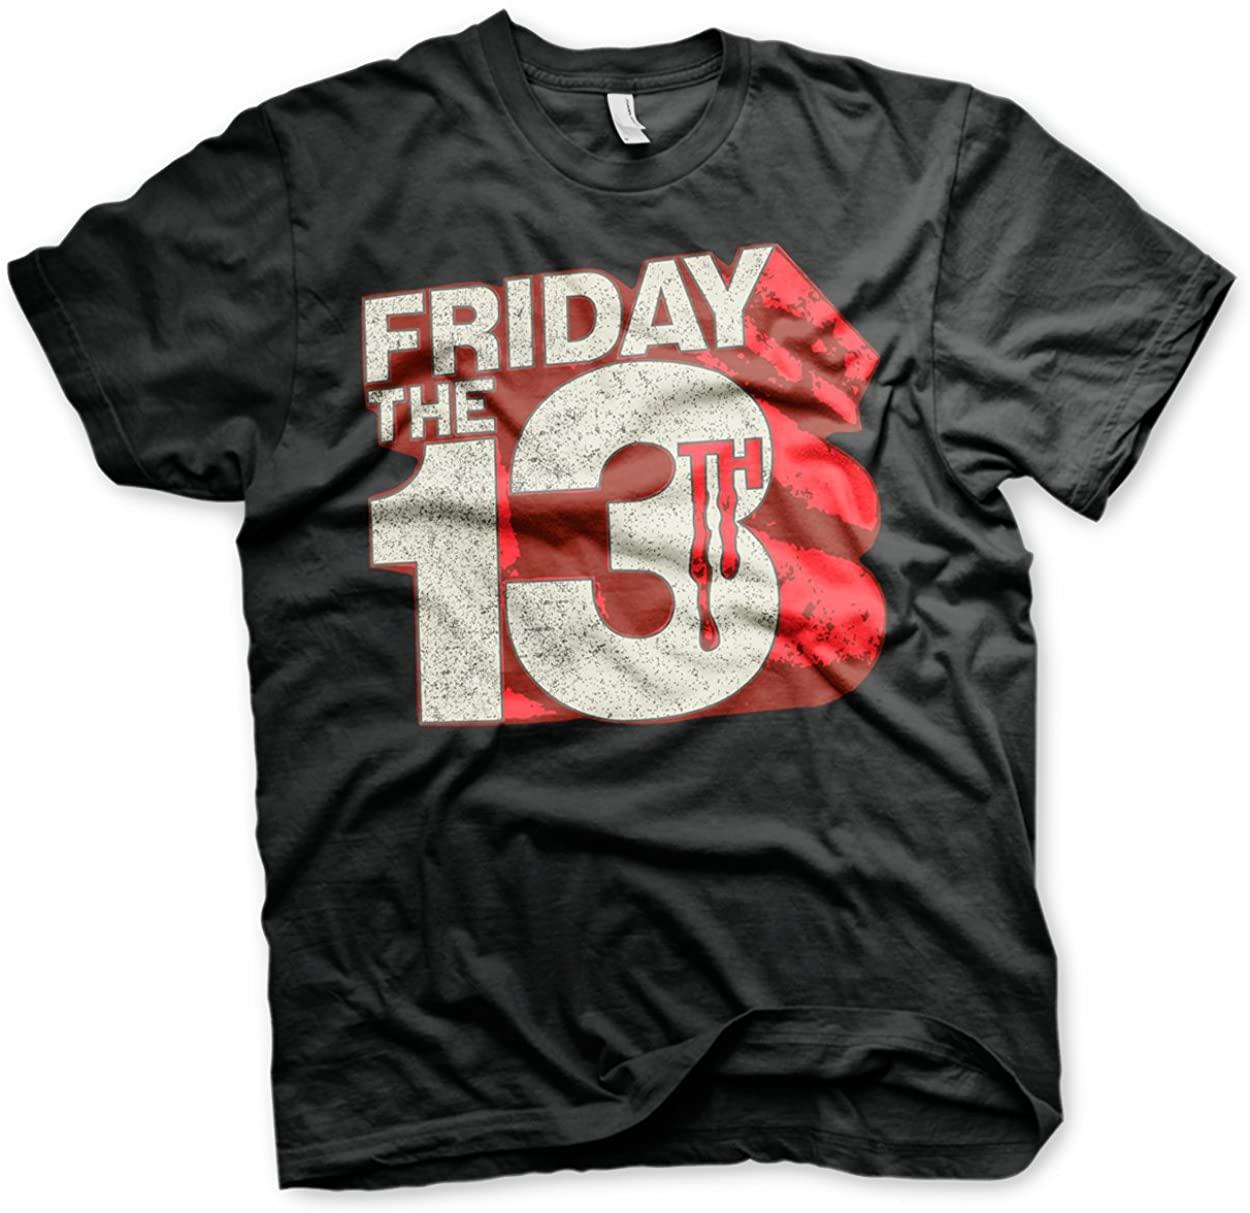 Friday The 13th Officially Licensed Block Logo 3XL,4XL,5XL Mens T-Shirt (Black)